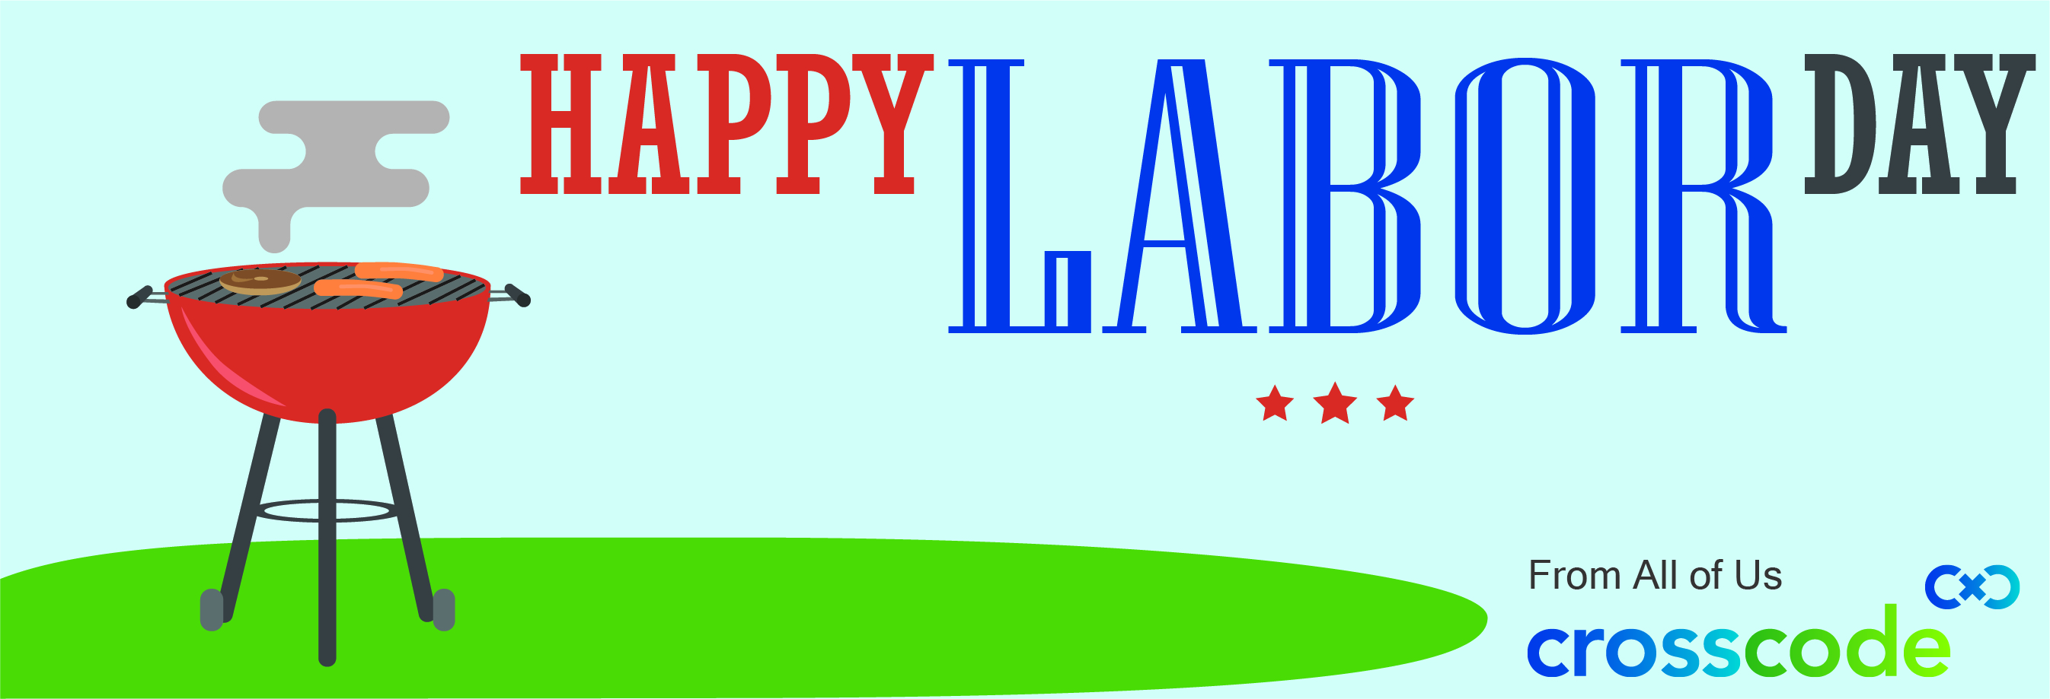 Happy Labor Day_LinkedIn